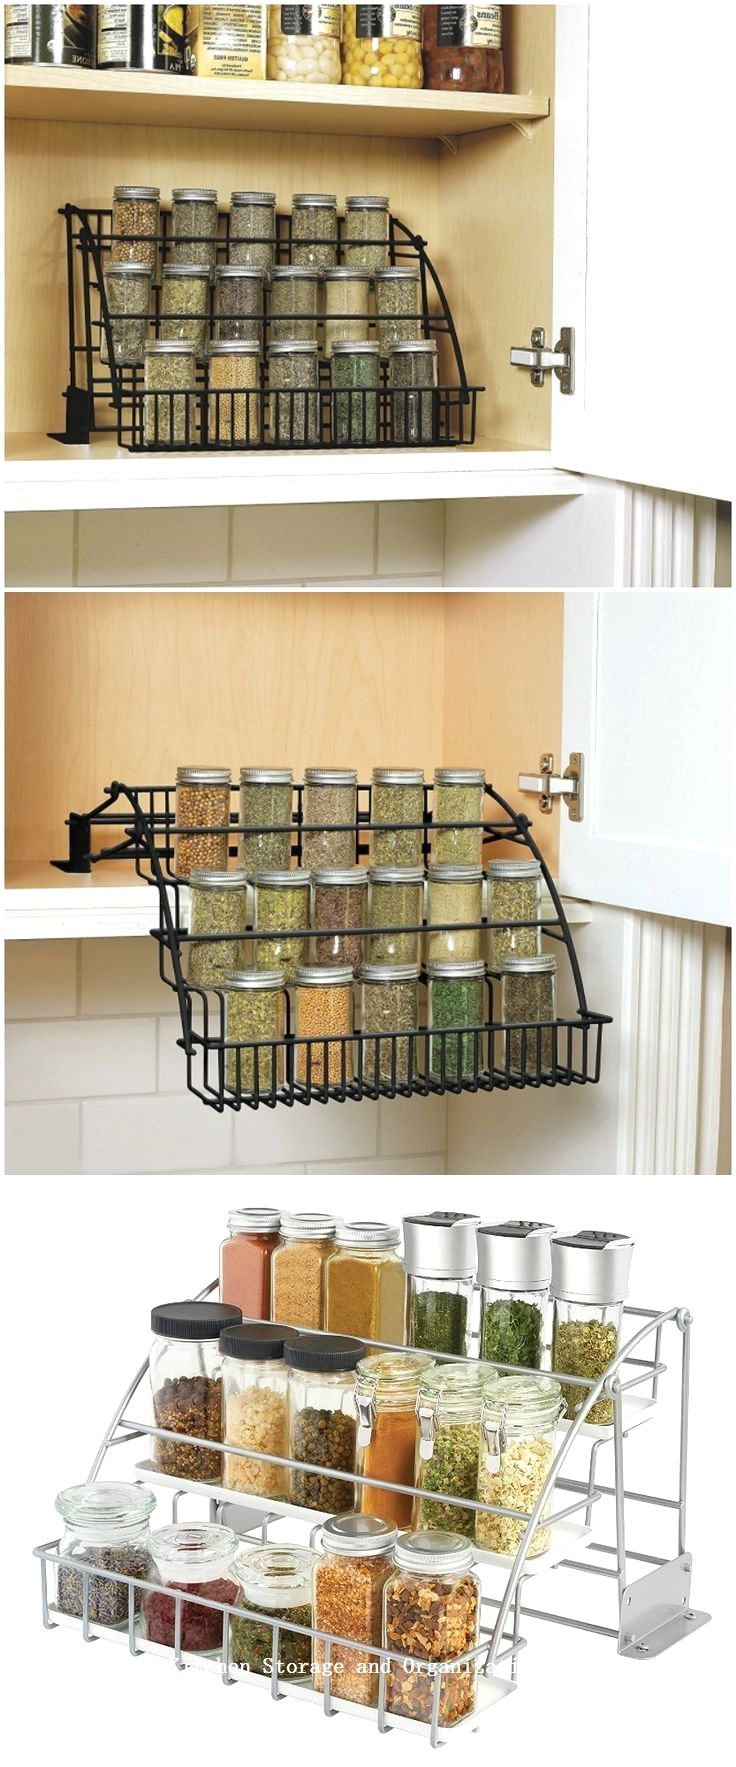 Diy Kitchen Storage And Organization Ideas On A Budget